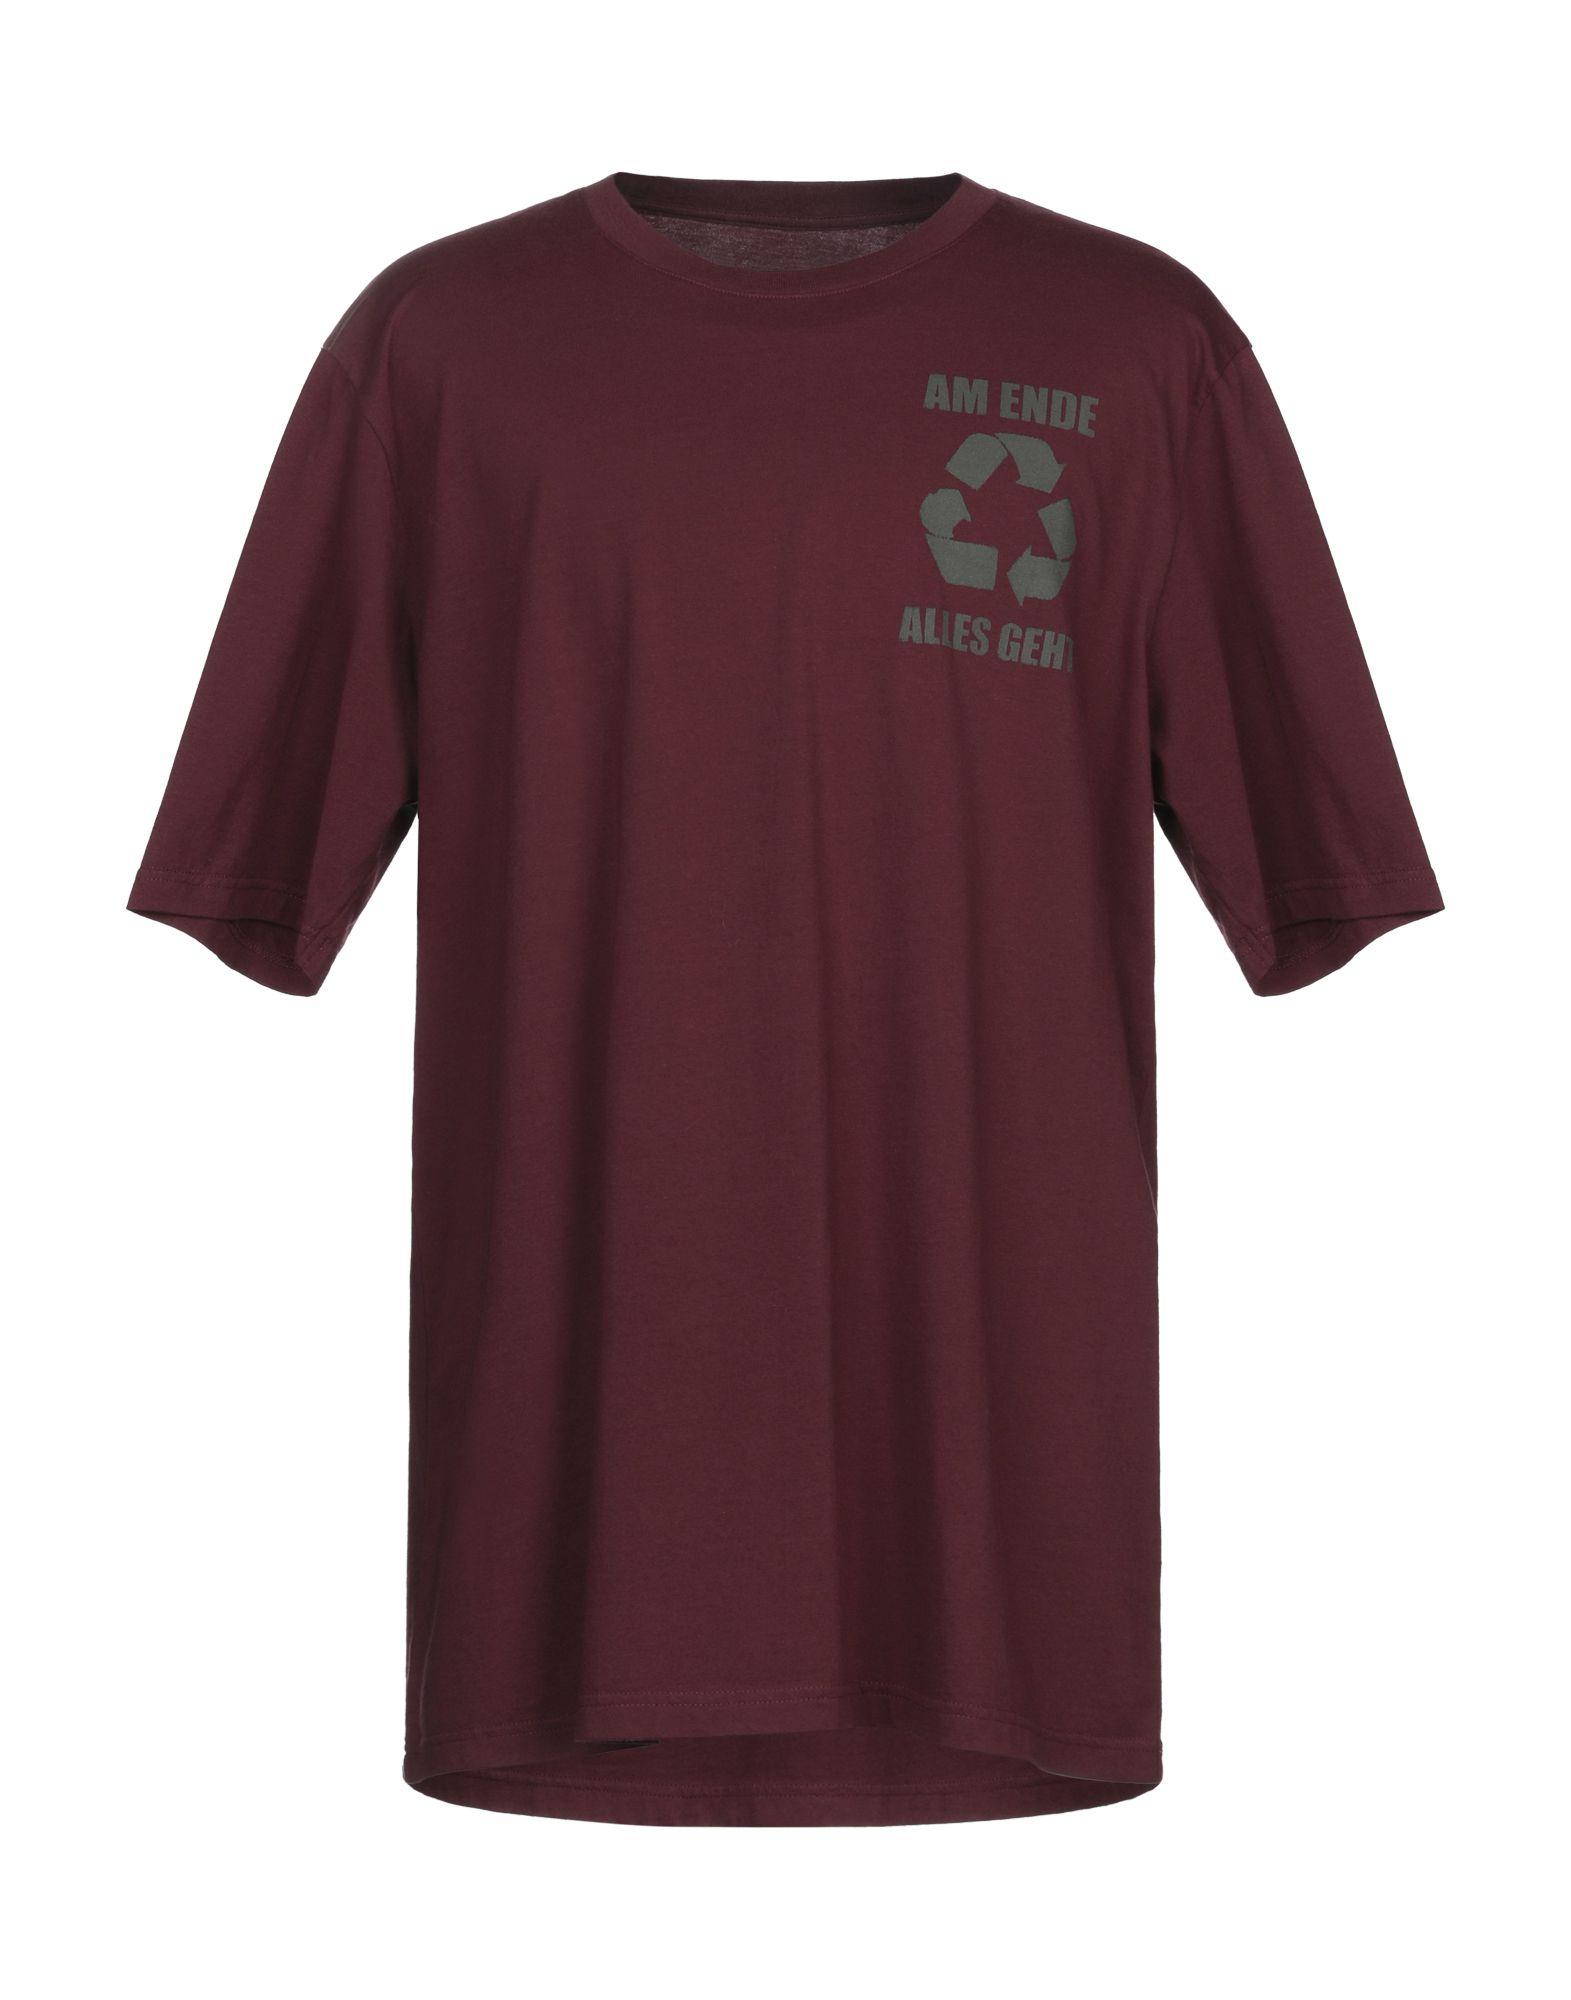 T-Shirt Faith Connexion uomo - 12358225ES 12358225ES 12358225ES 5ab